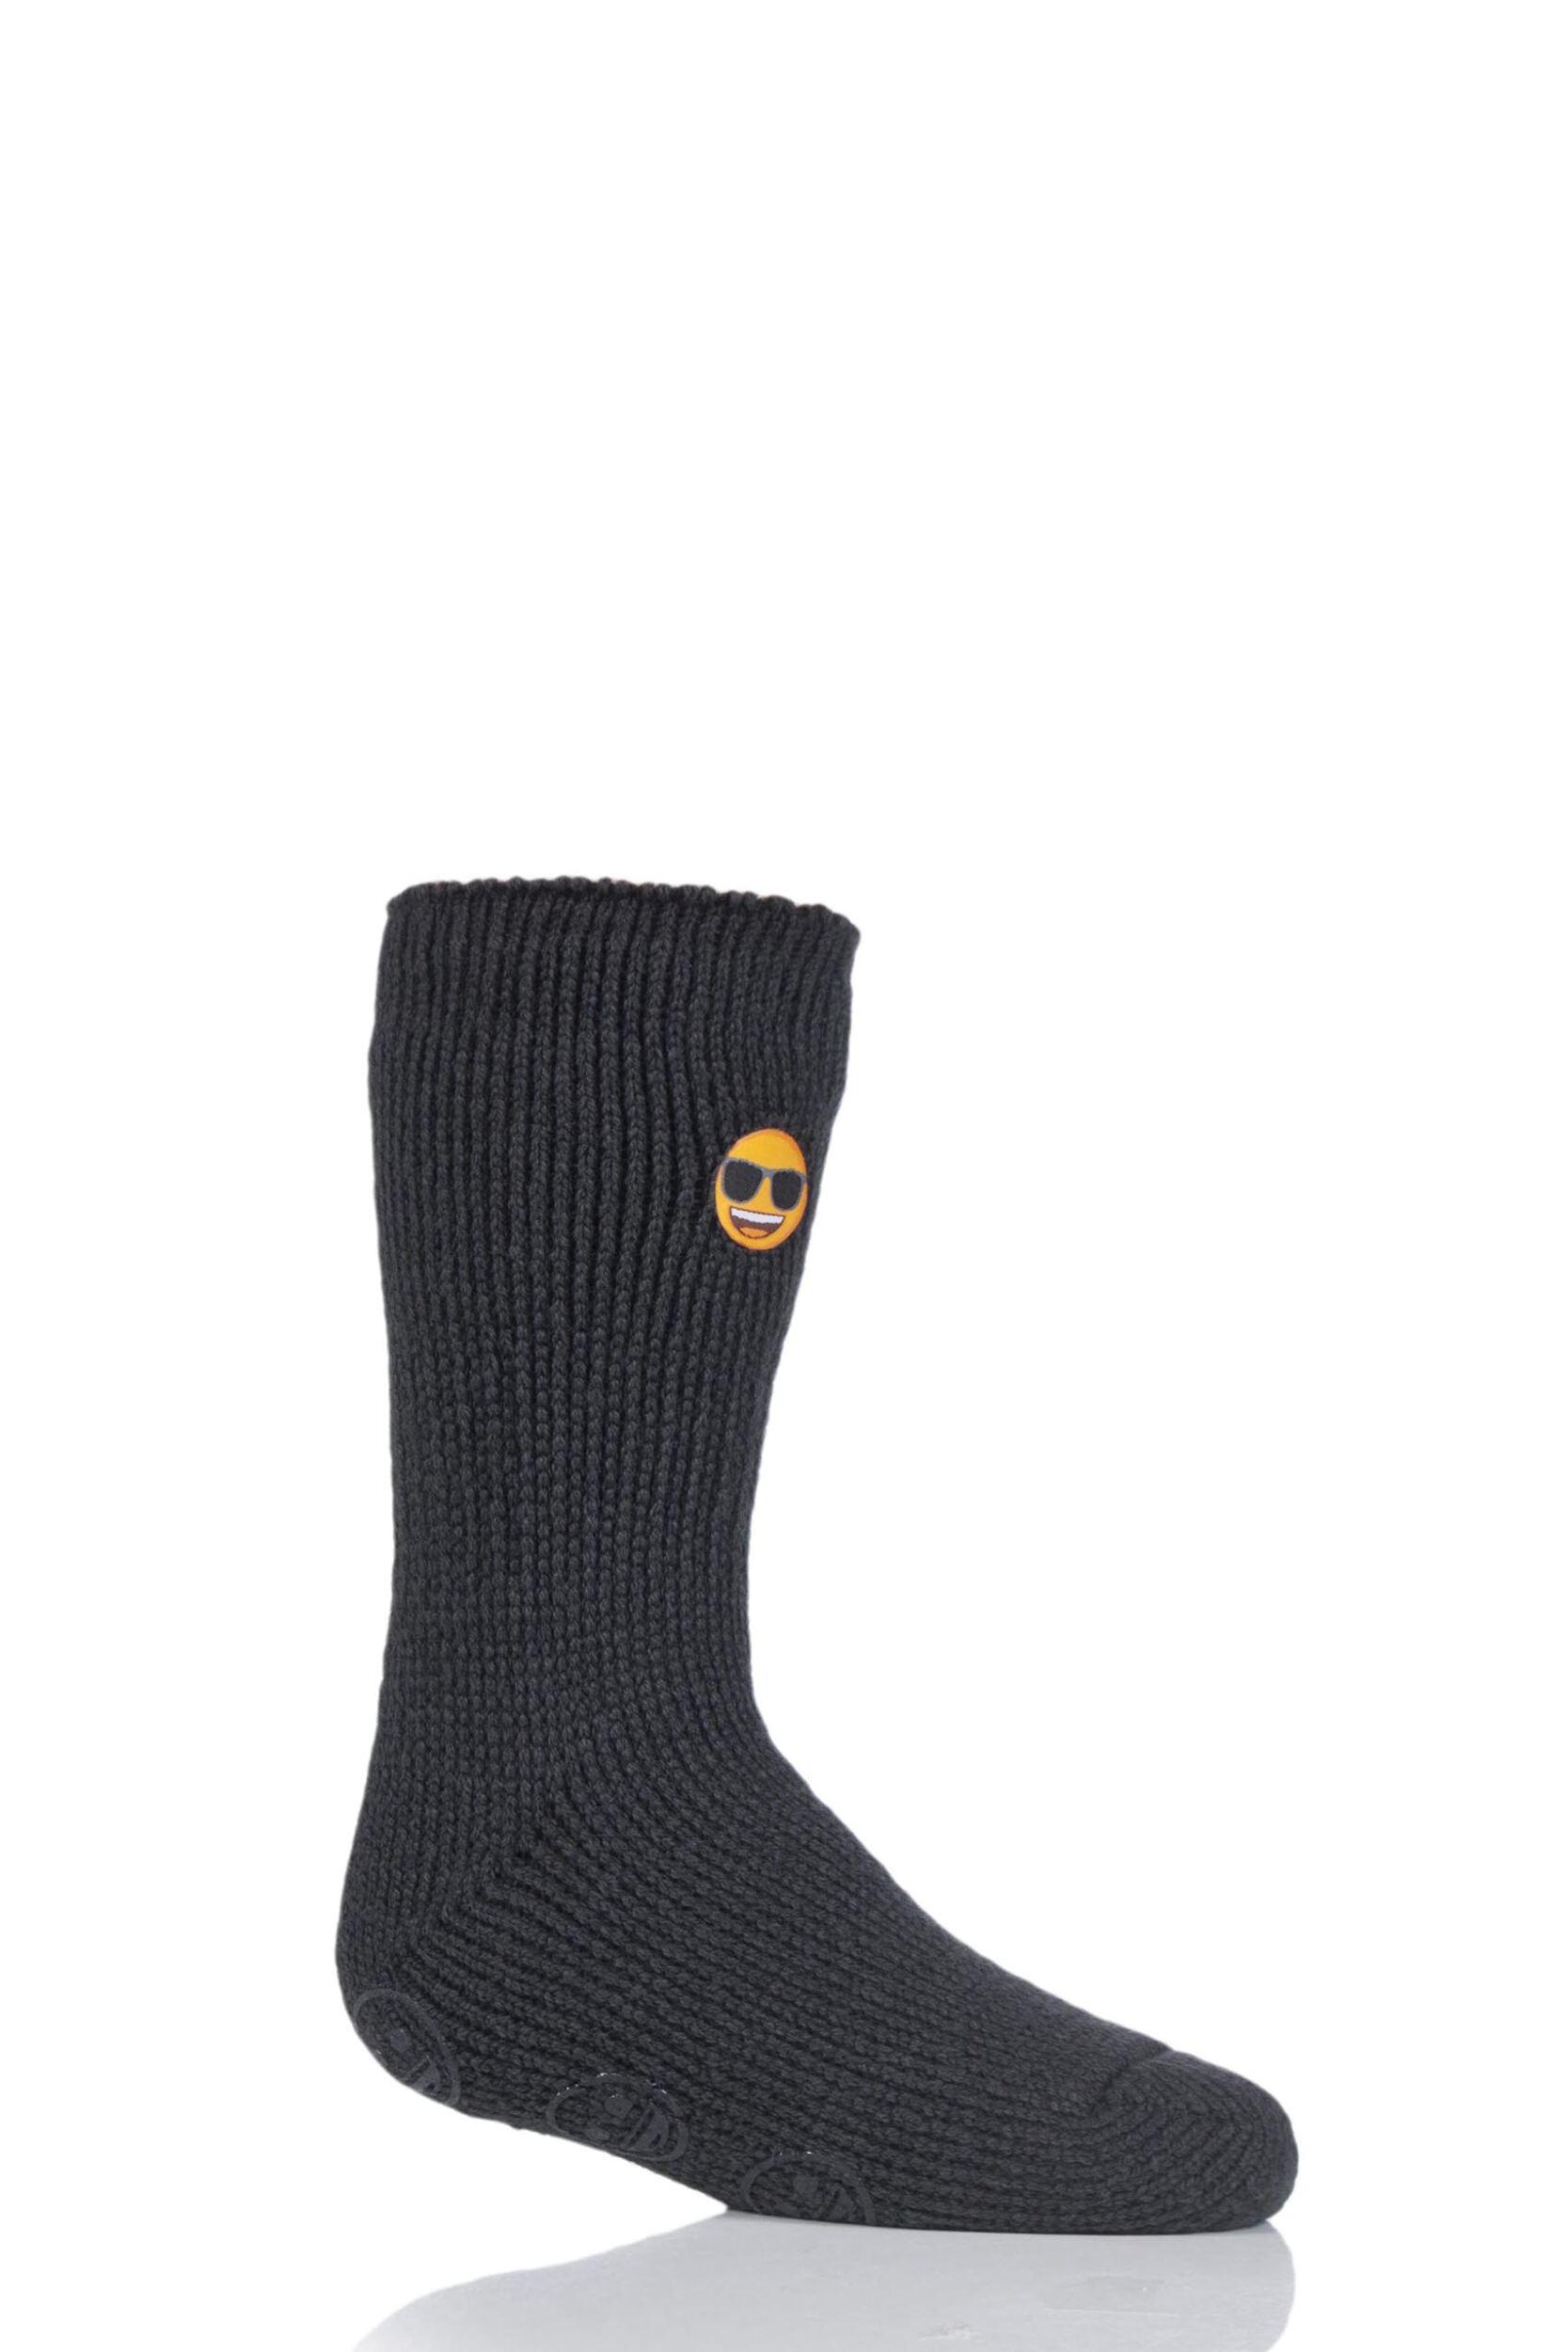 Image of 1 Pair Charcoal Emoji Sunglasses Face Slipper Socks Kids Unisex 9-12 Kids (4-7 Years) - Heat Holders